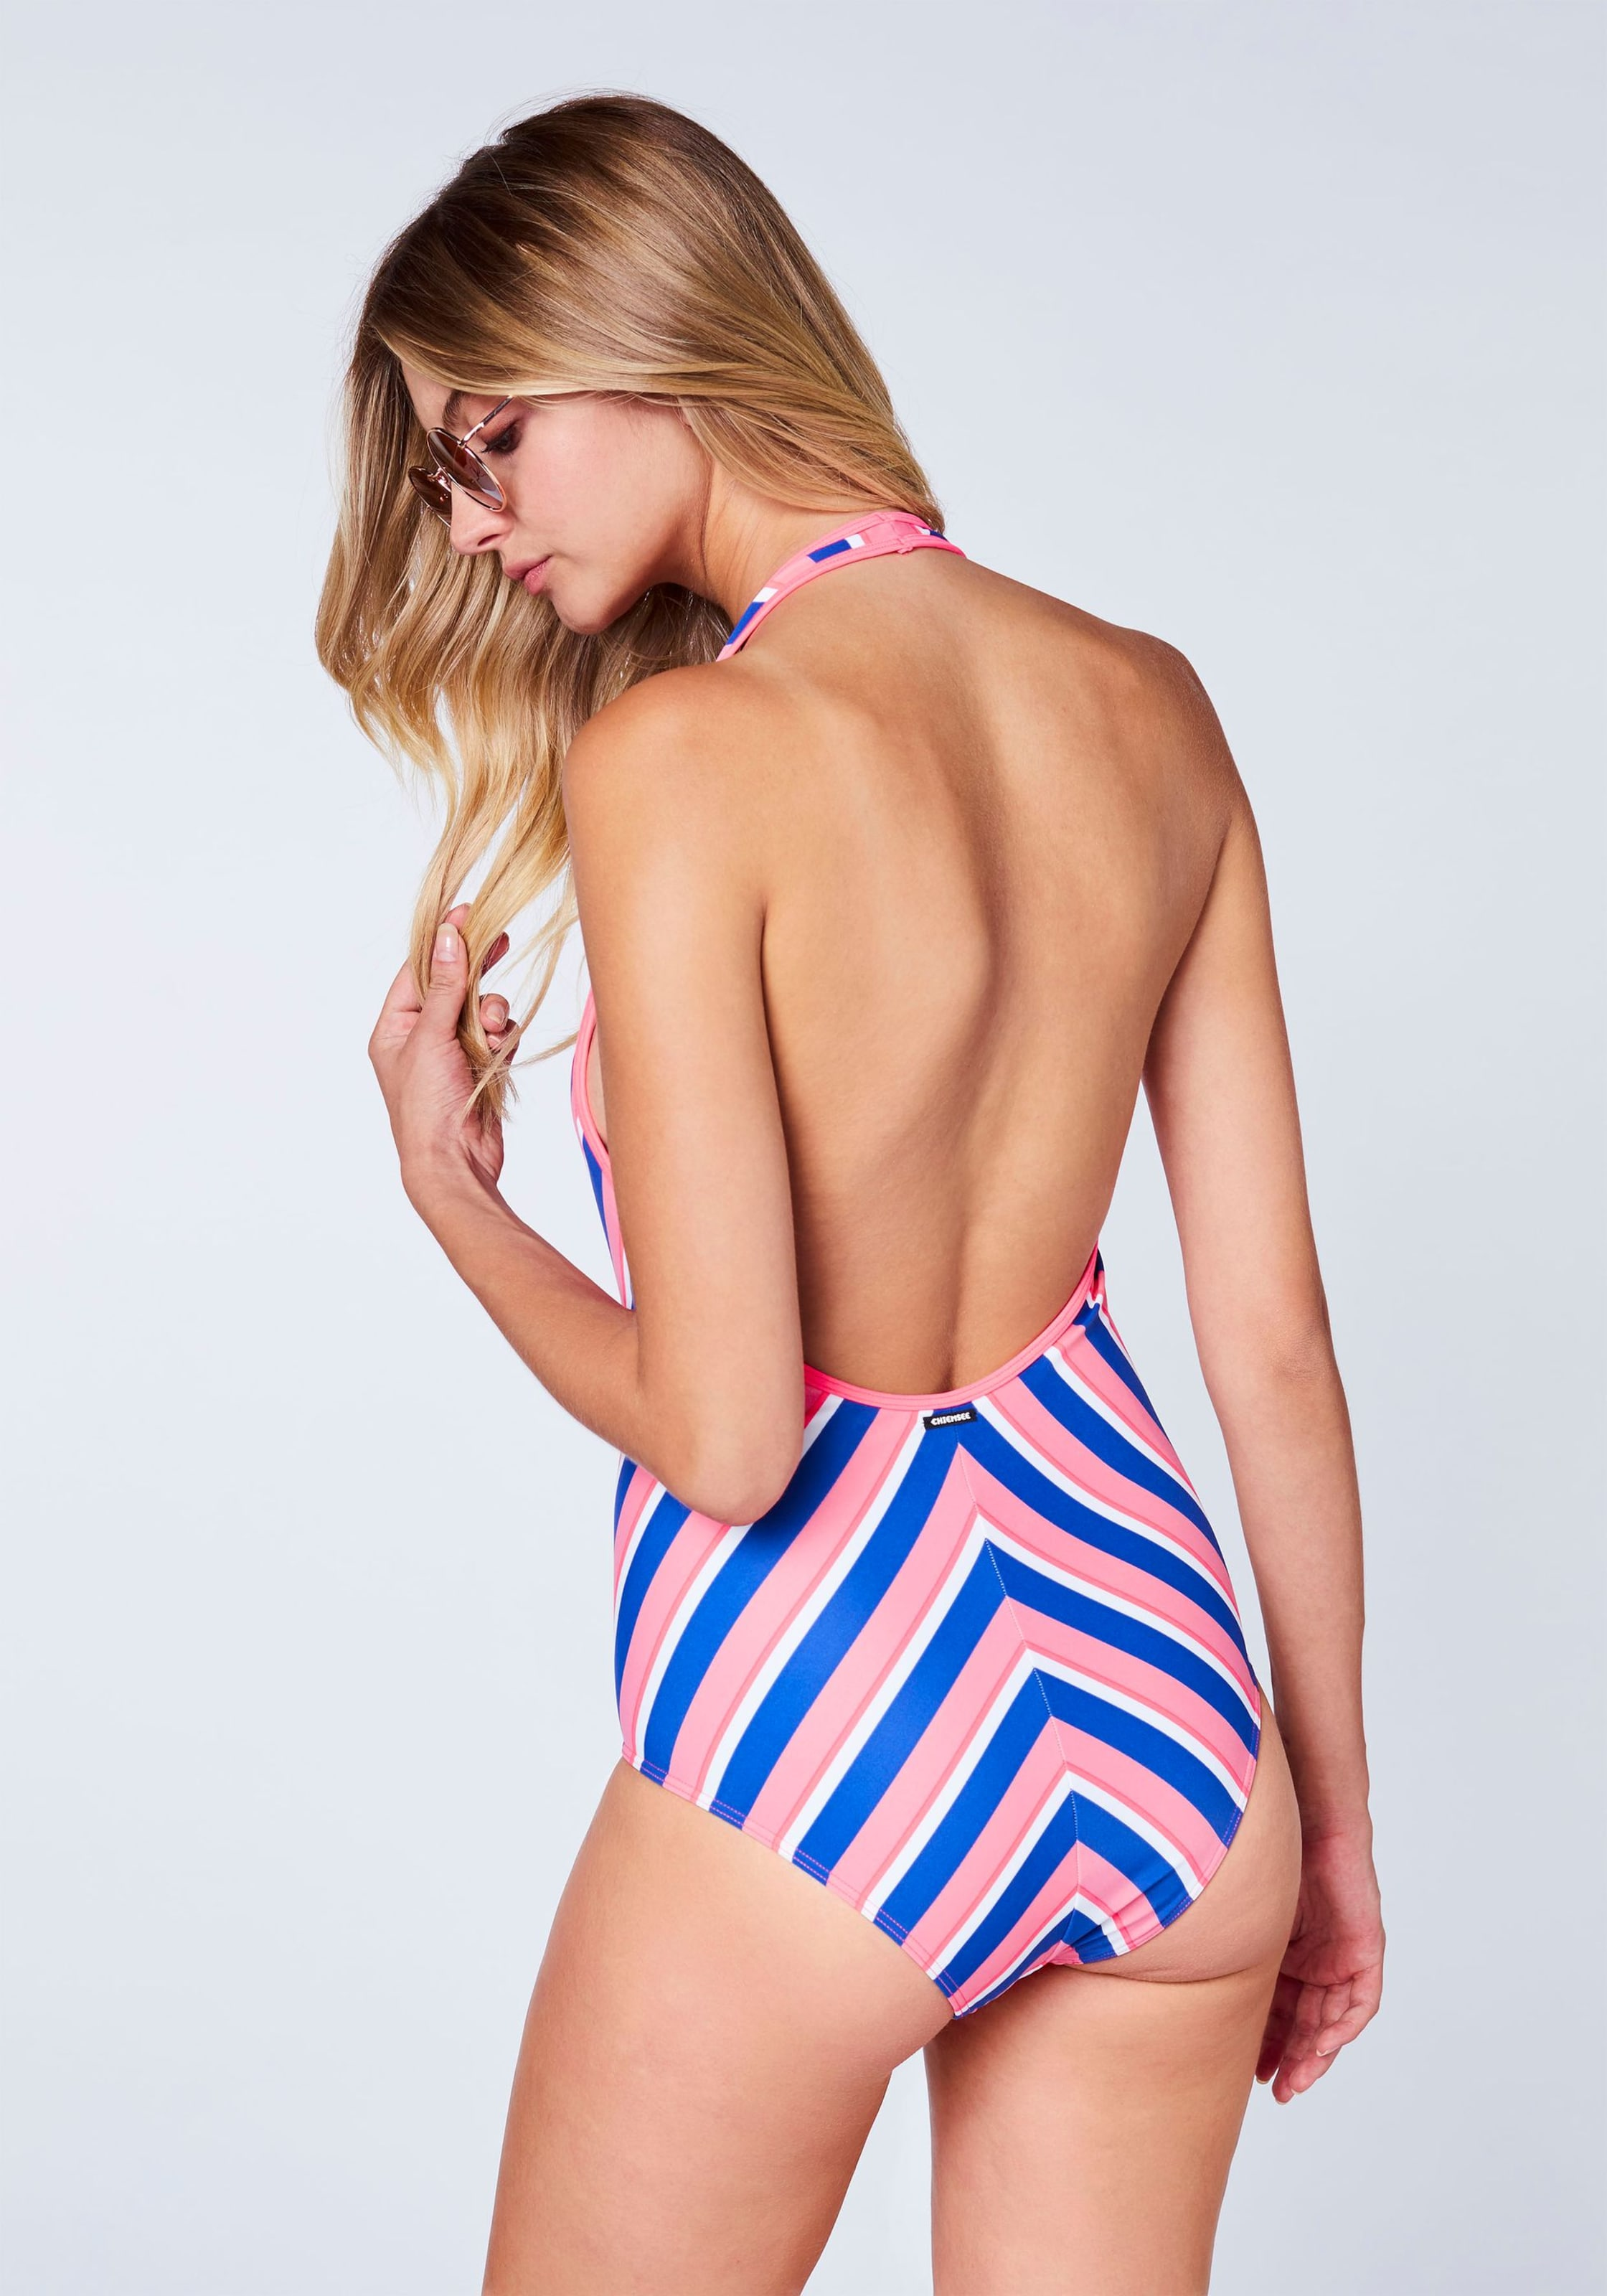 Chiemsee 'acapulco En Maillot De Beach Noir Bain WomenSwimsuits' PkZuXiO